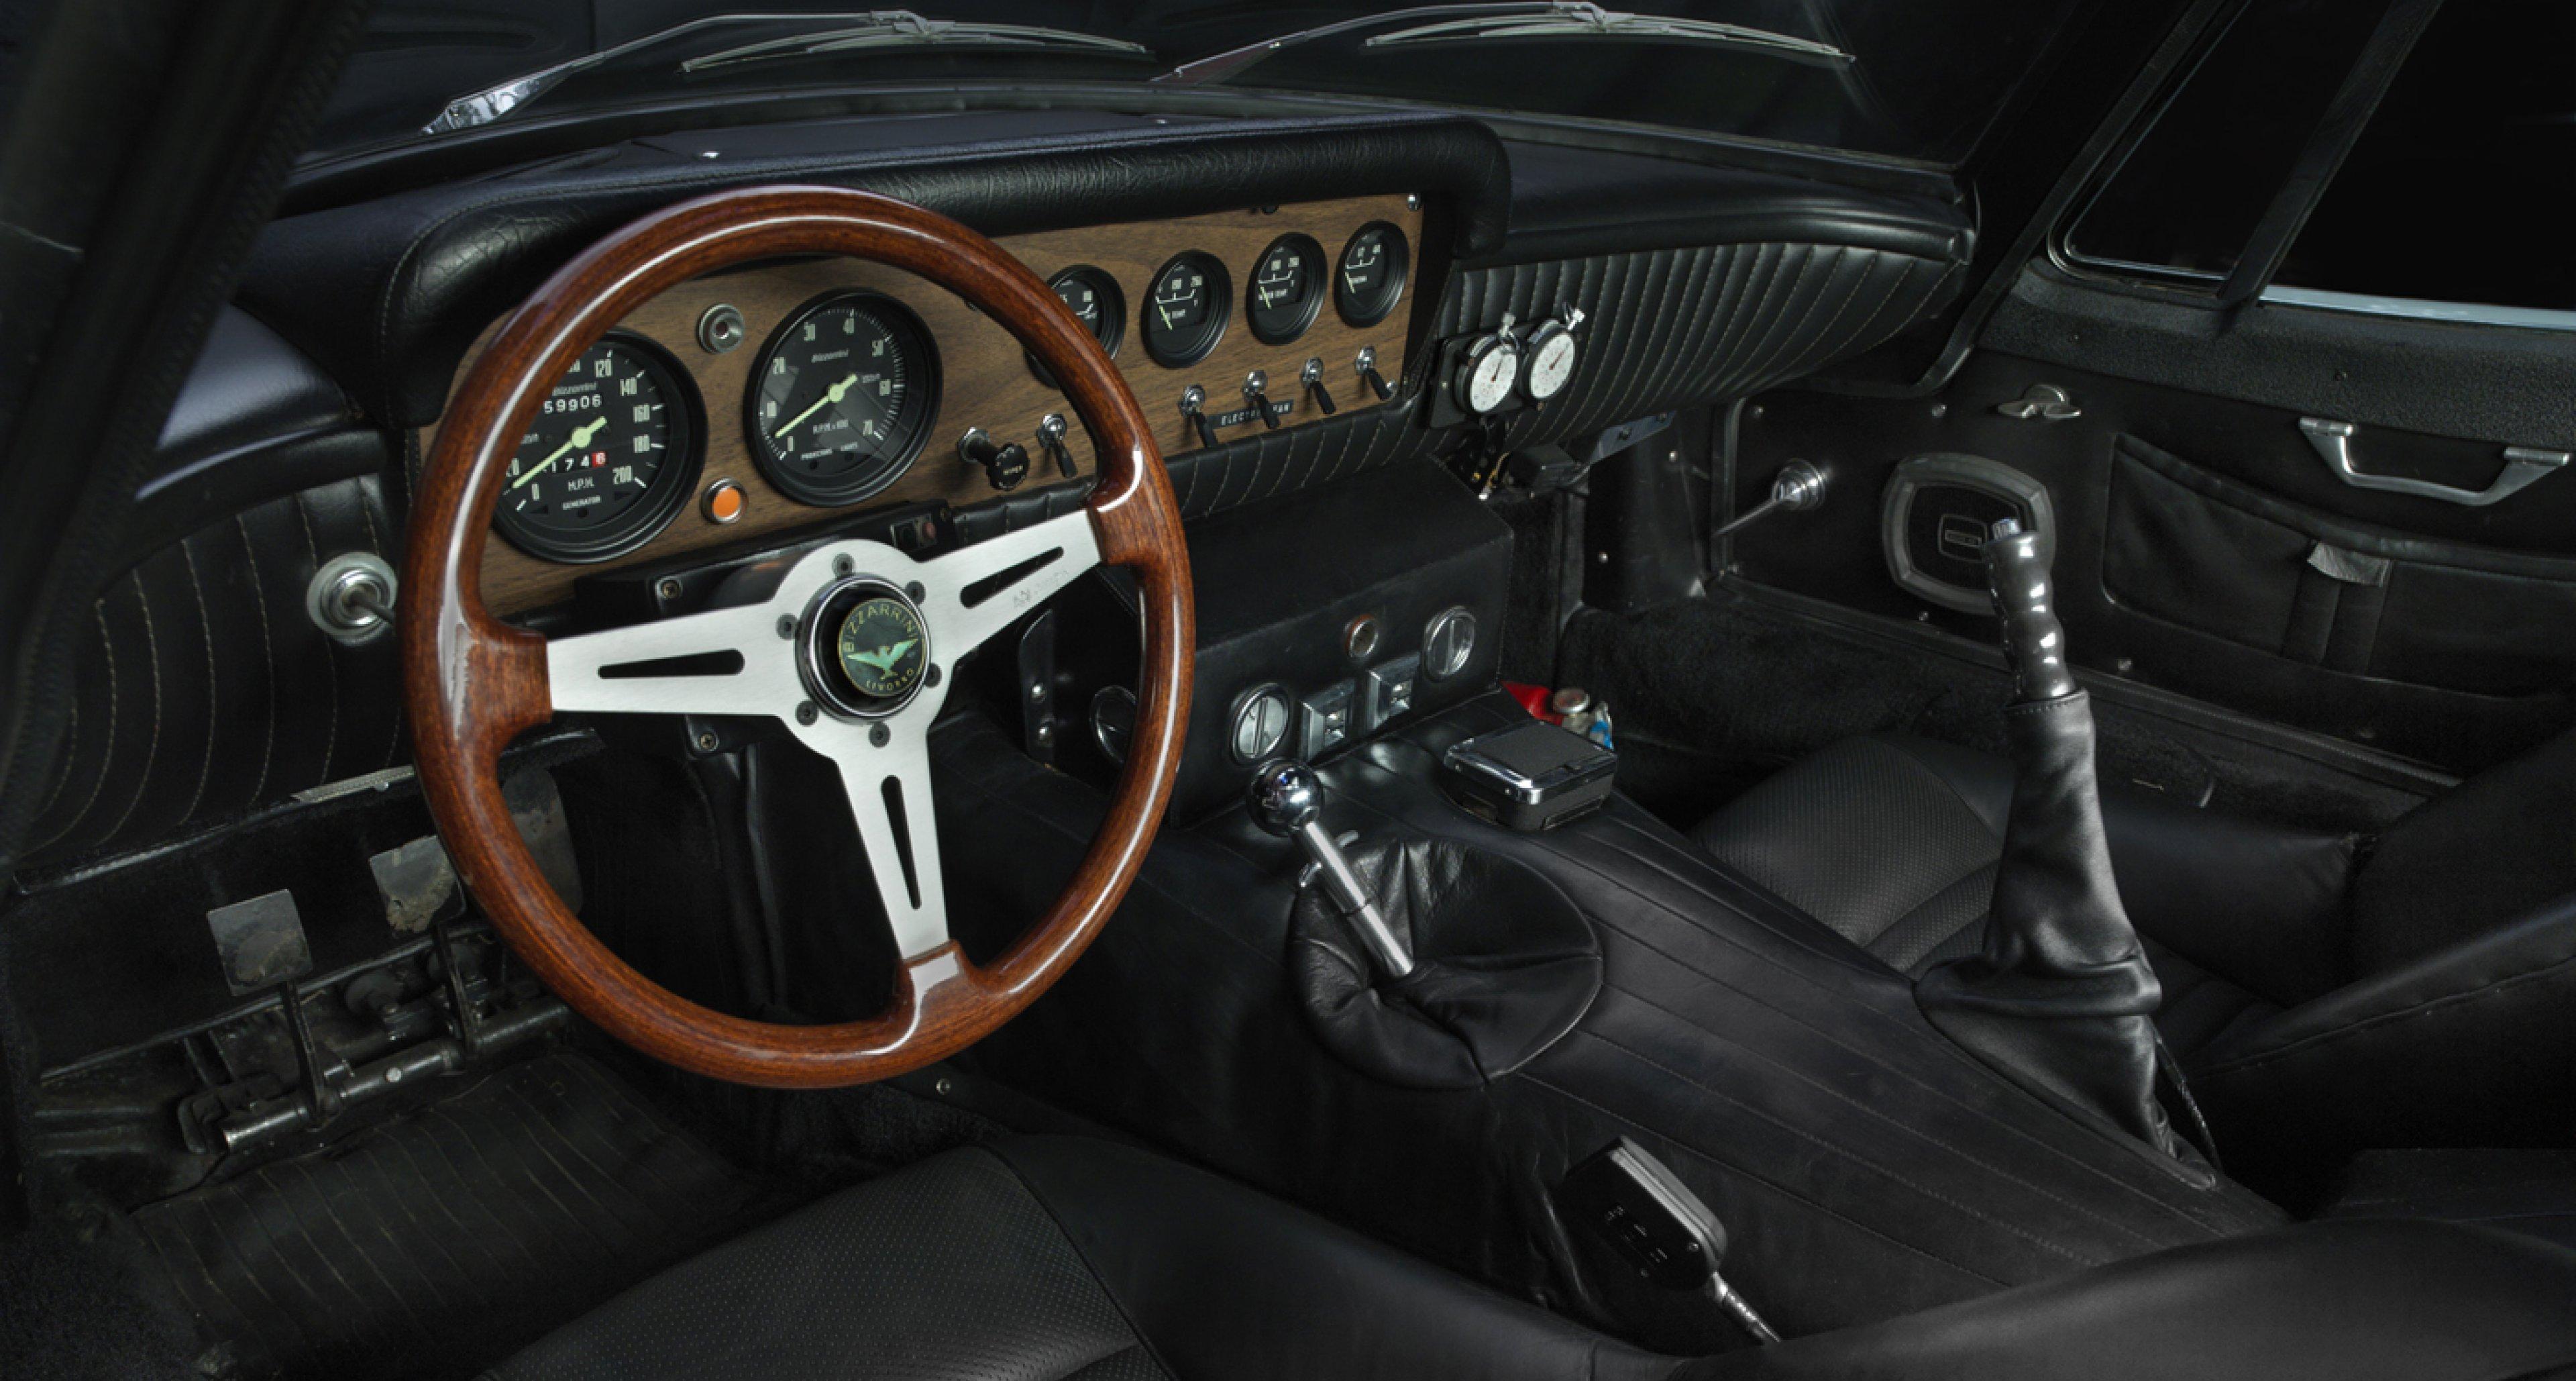 1968 Bizzarrini 5300 Strada Coupe. Collection of Don Meluzio. Image © 2015 Peter Harholdt